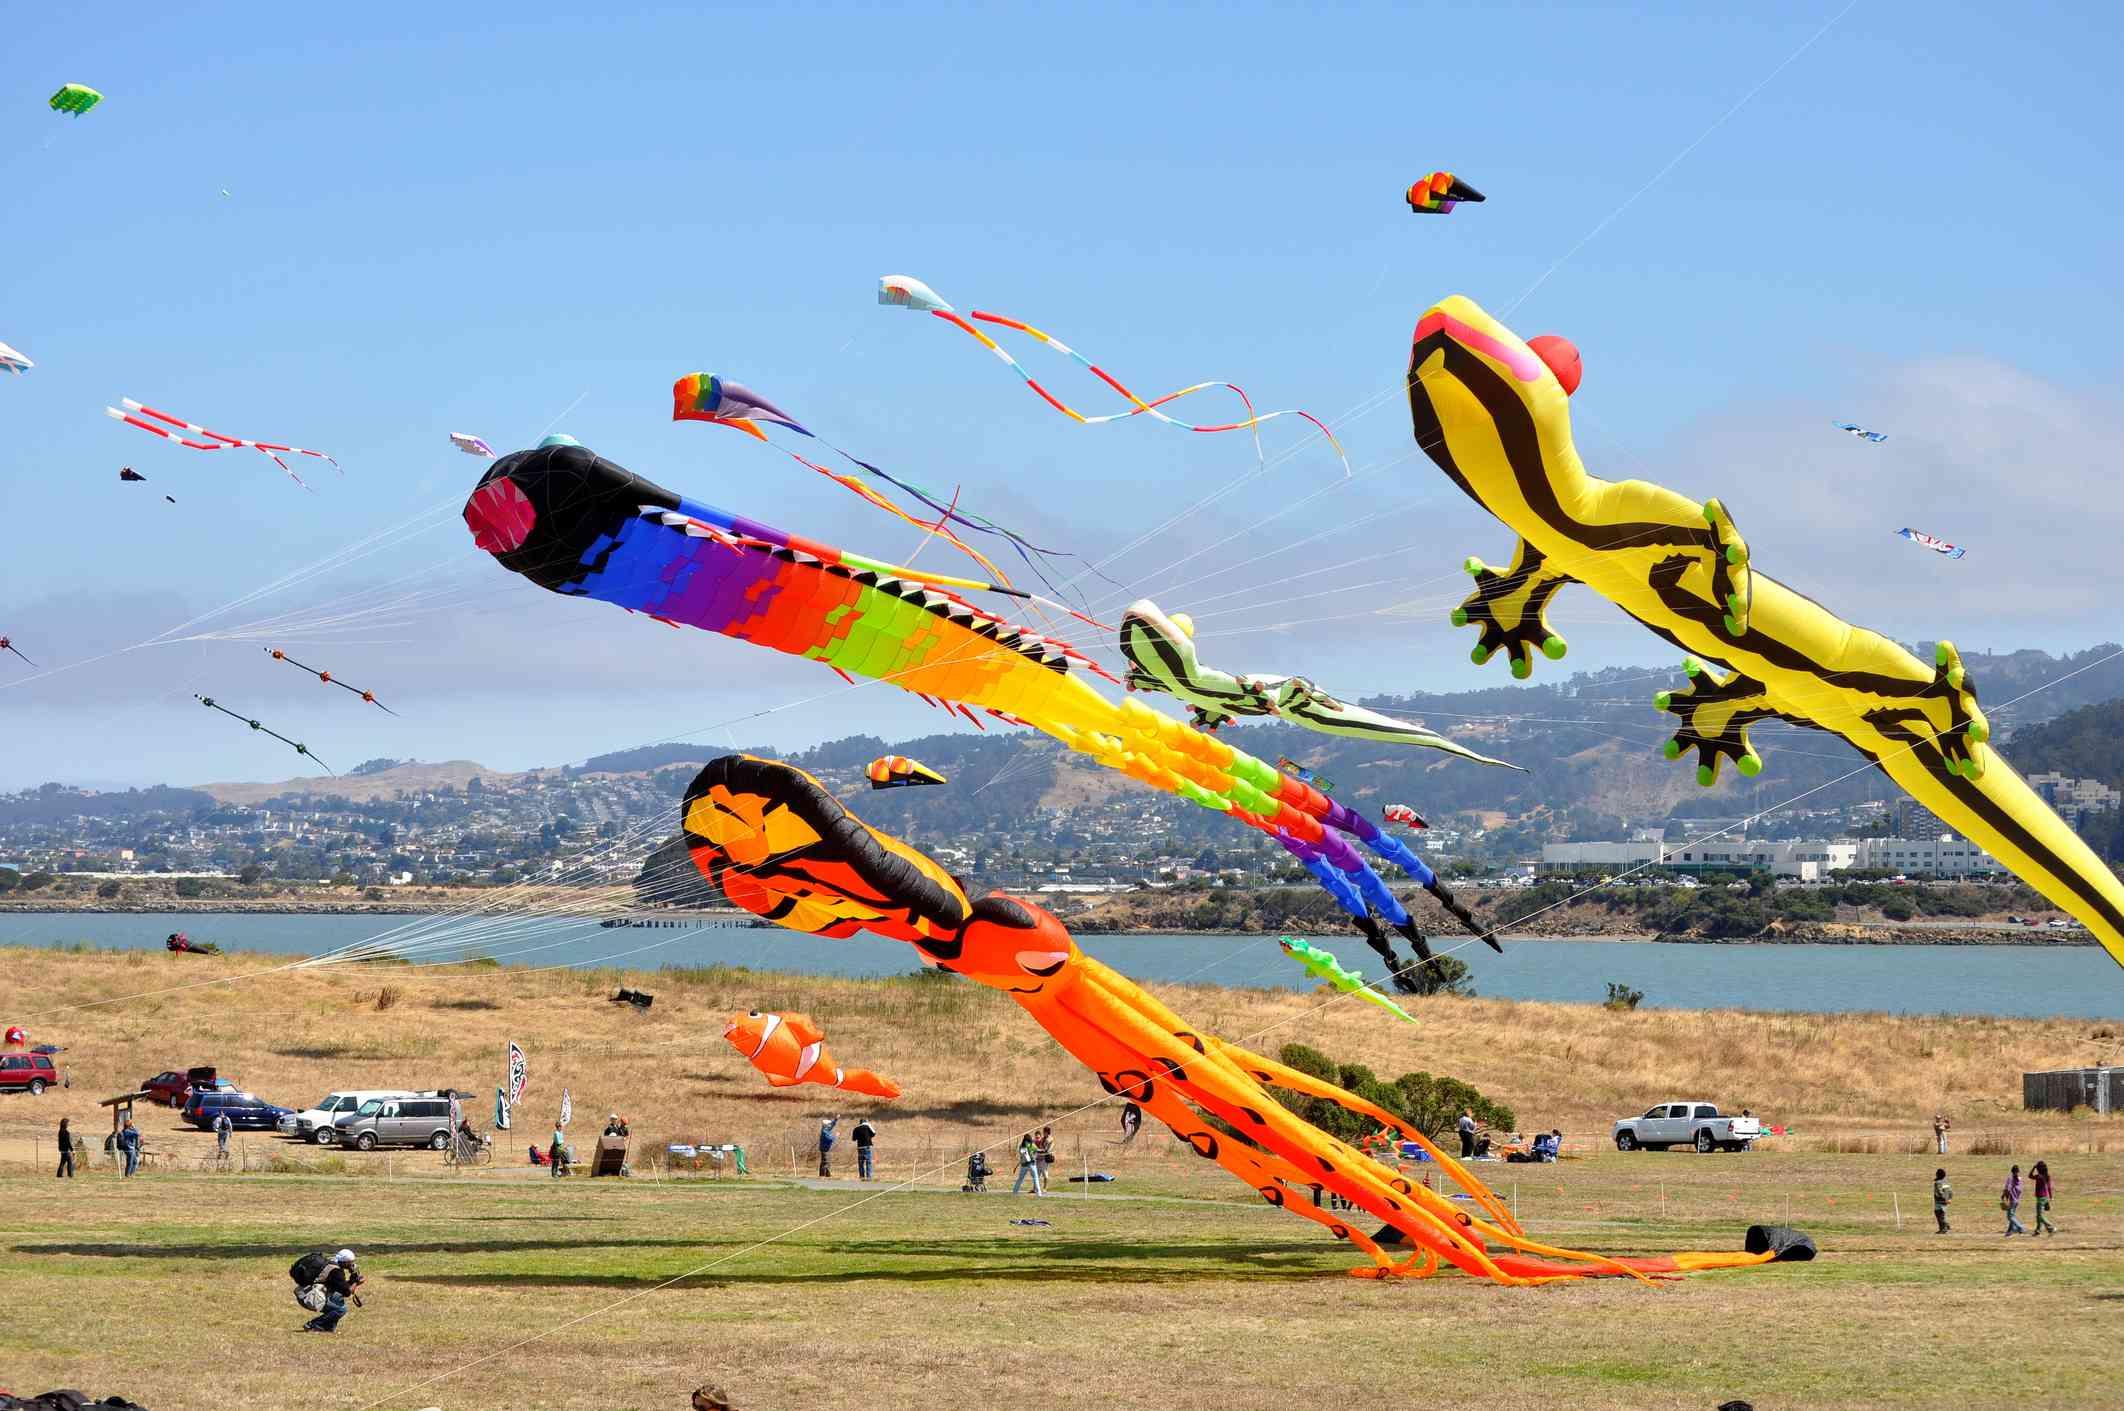 regular and enormous kites flying at the Berkeley Marina